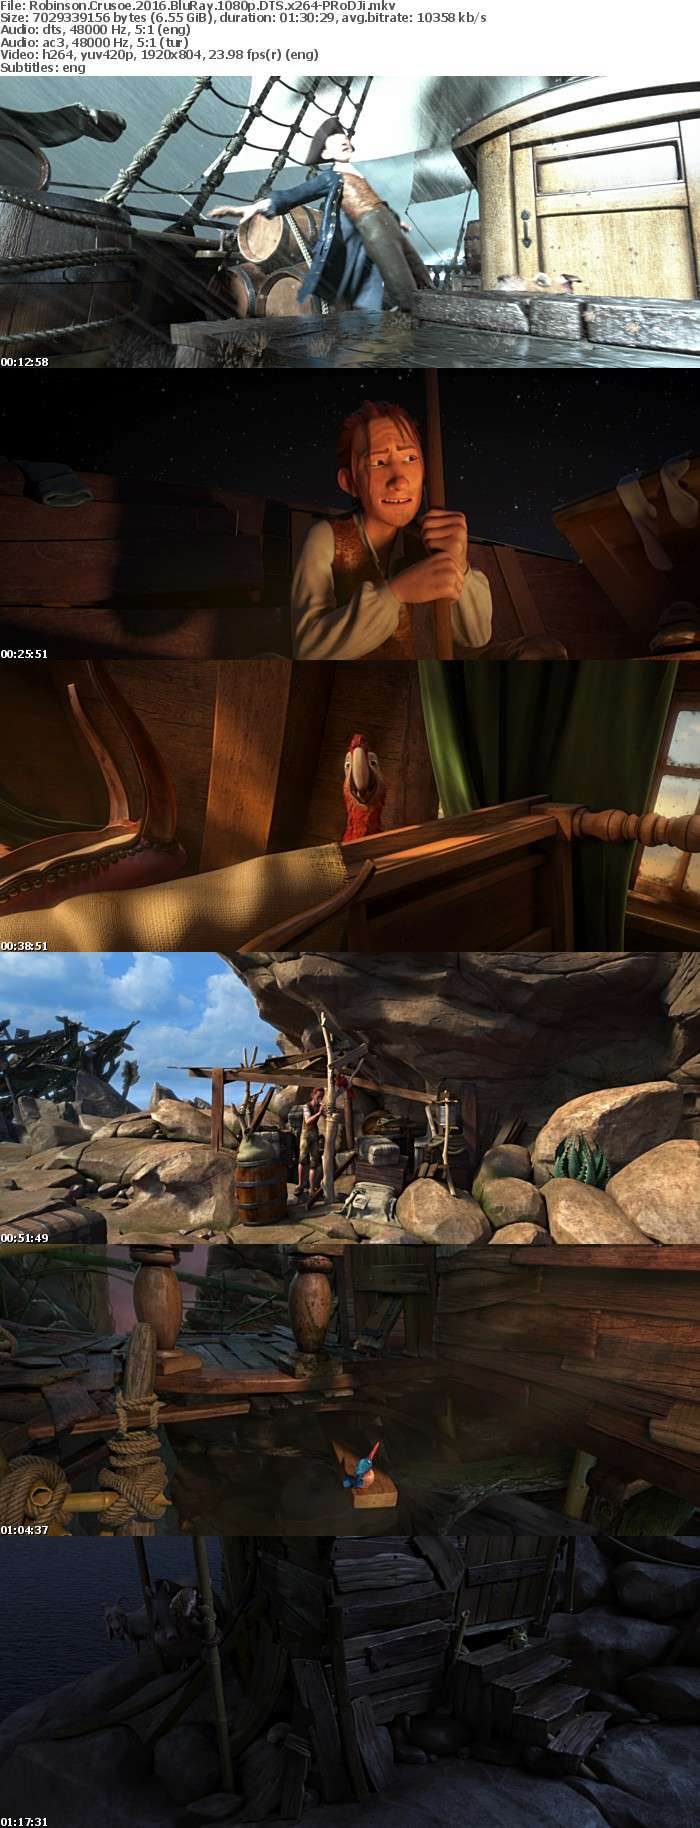 Robinson Crusoe 2016 BluRay 1080p DTS x264-PRoDJi